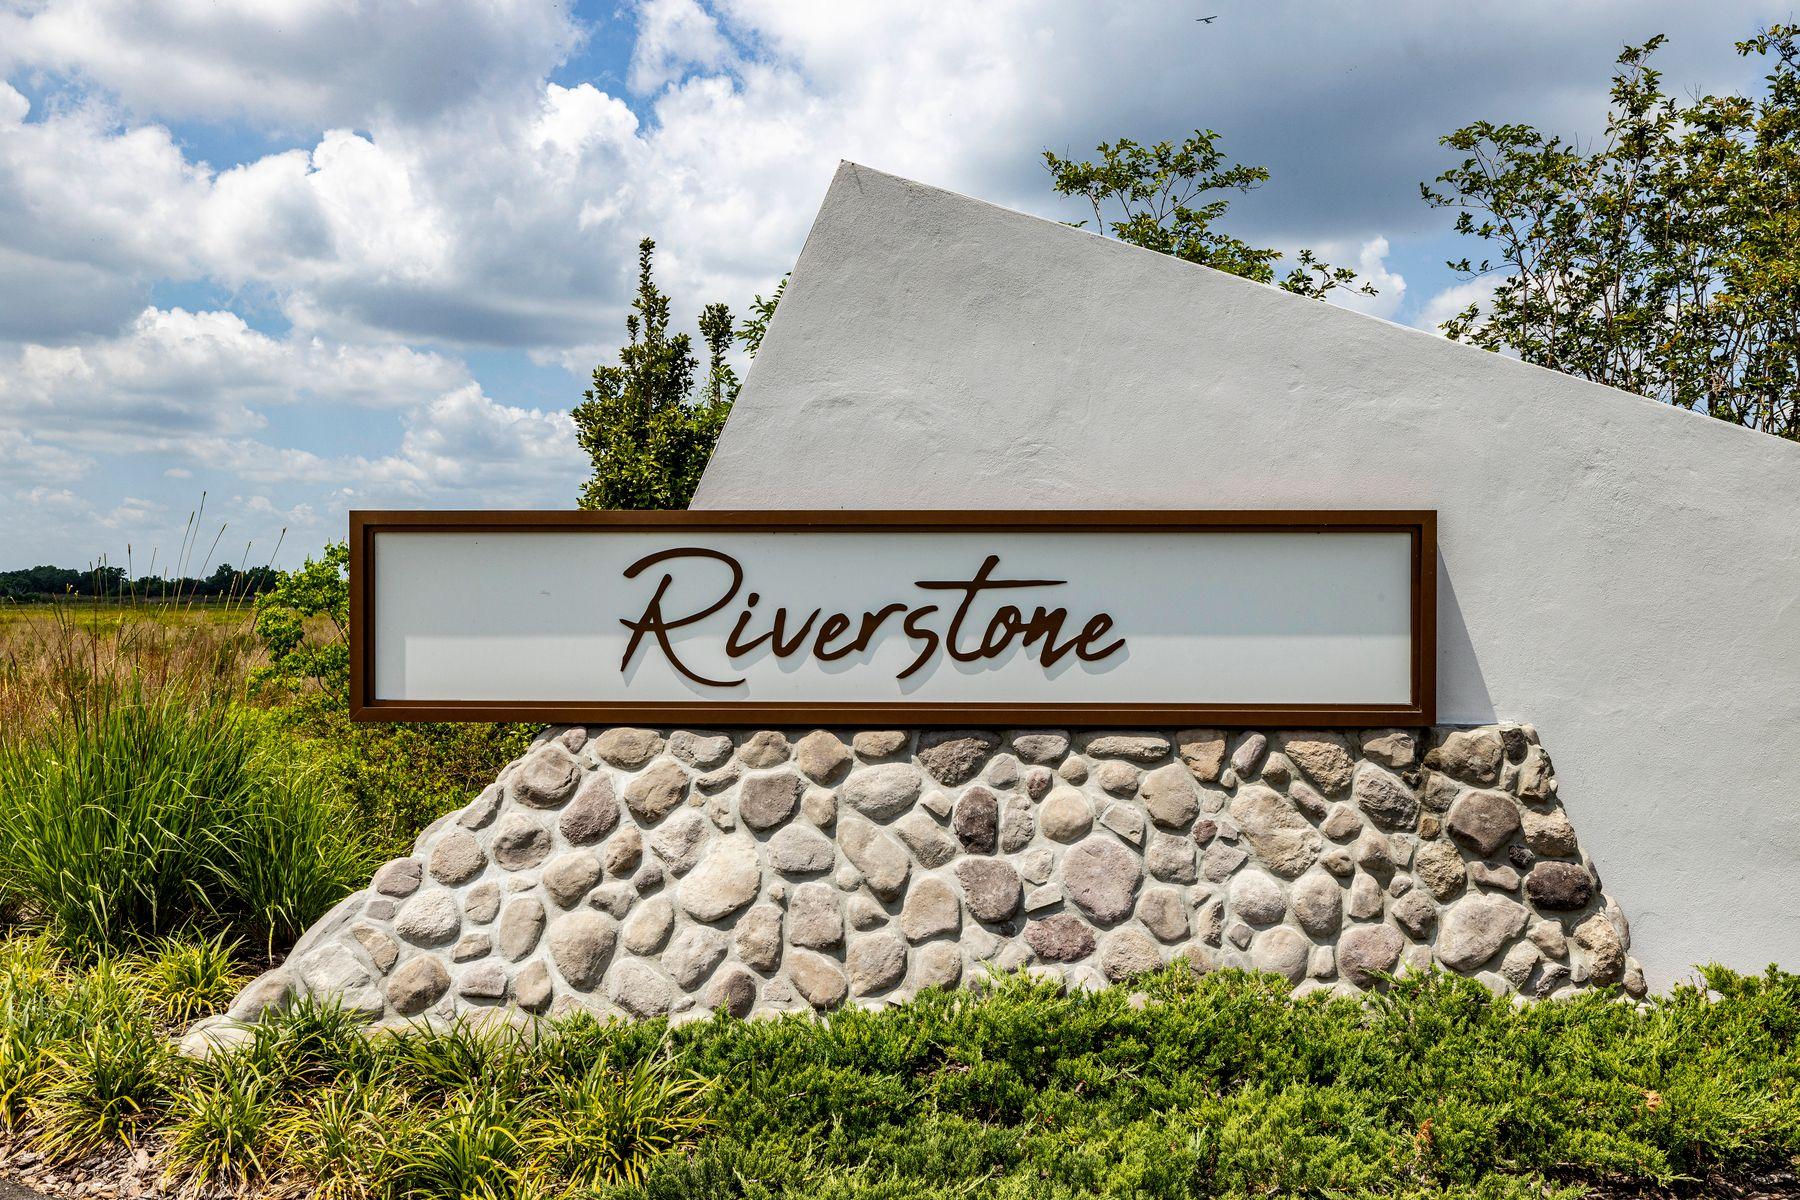 LGI Homes at Riverstone